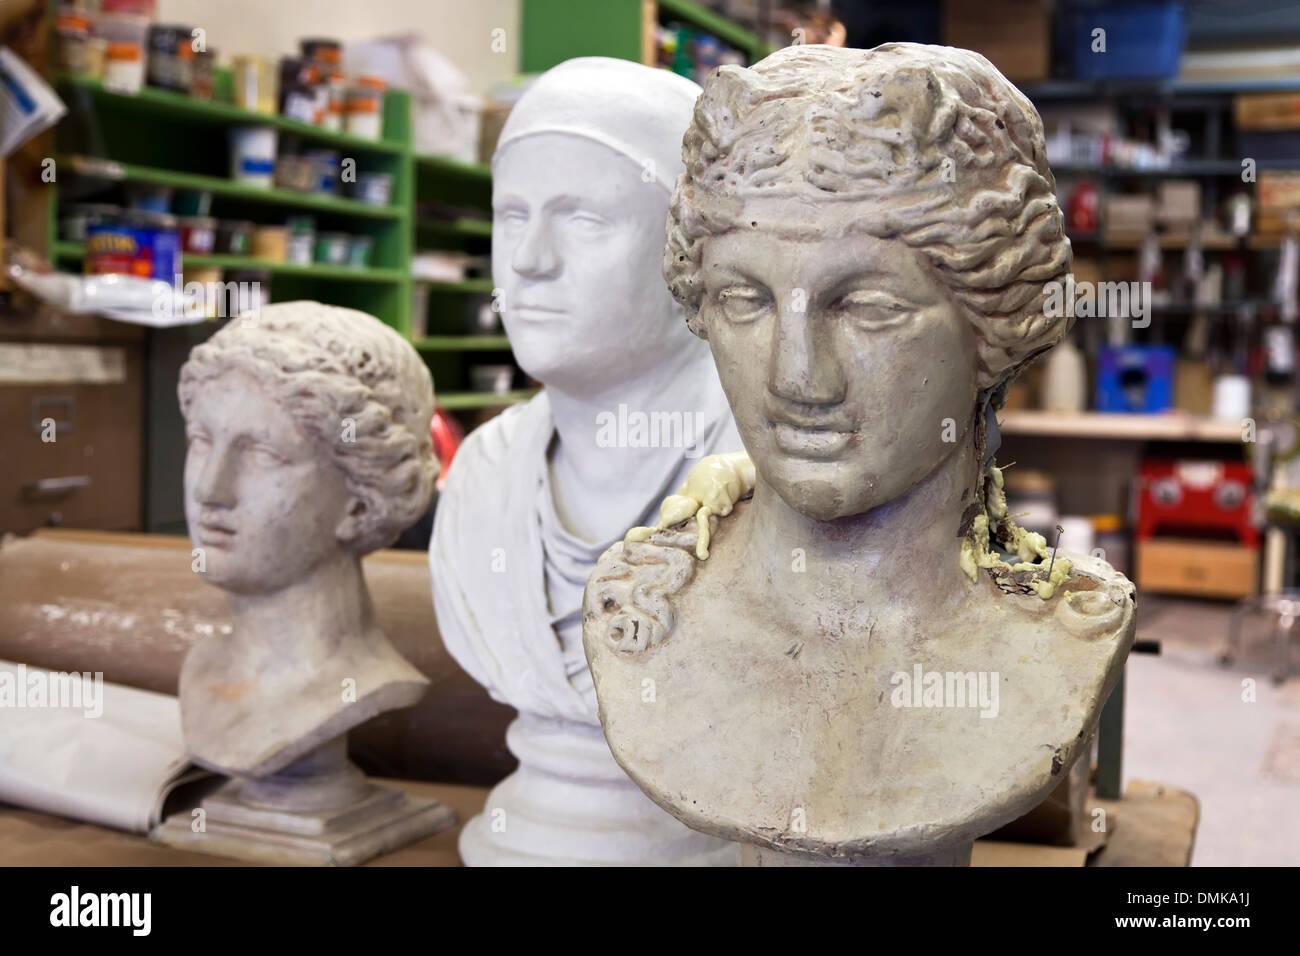 Busts, prop shop, Santa Fe Opera, Santa Fe, New Mexico USA - Stock Image